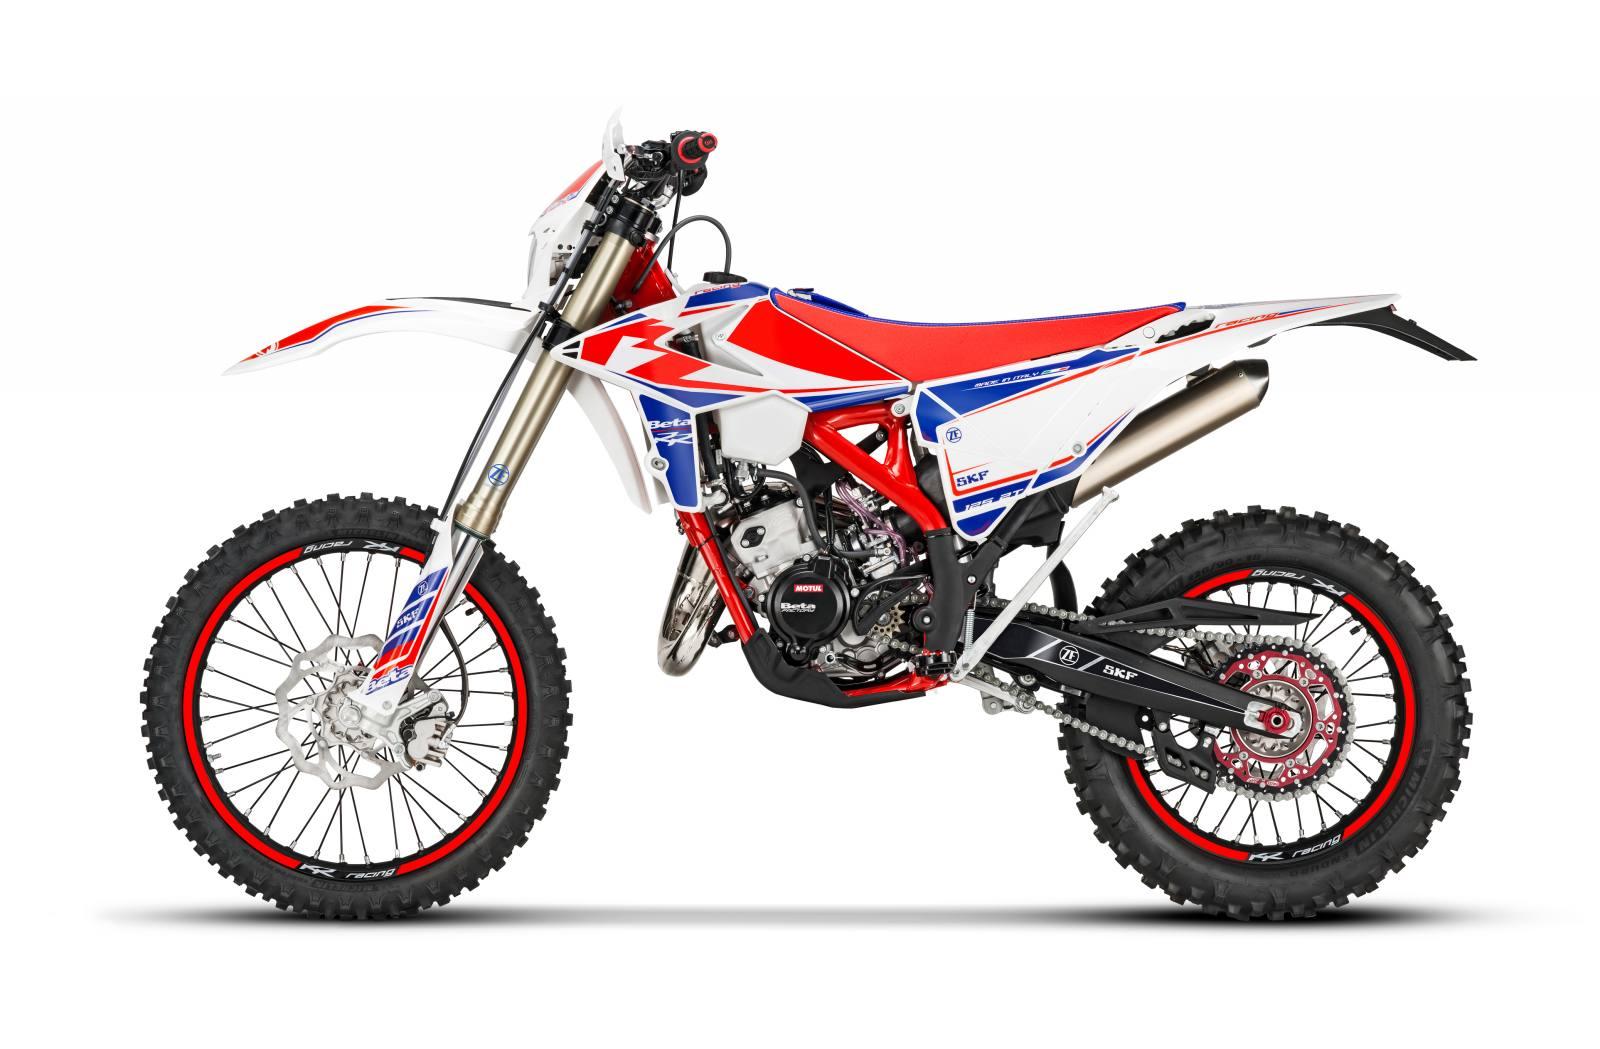 2019 Beta Motorcycles 125 RR 2-Stroke Race Edition